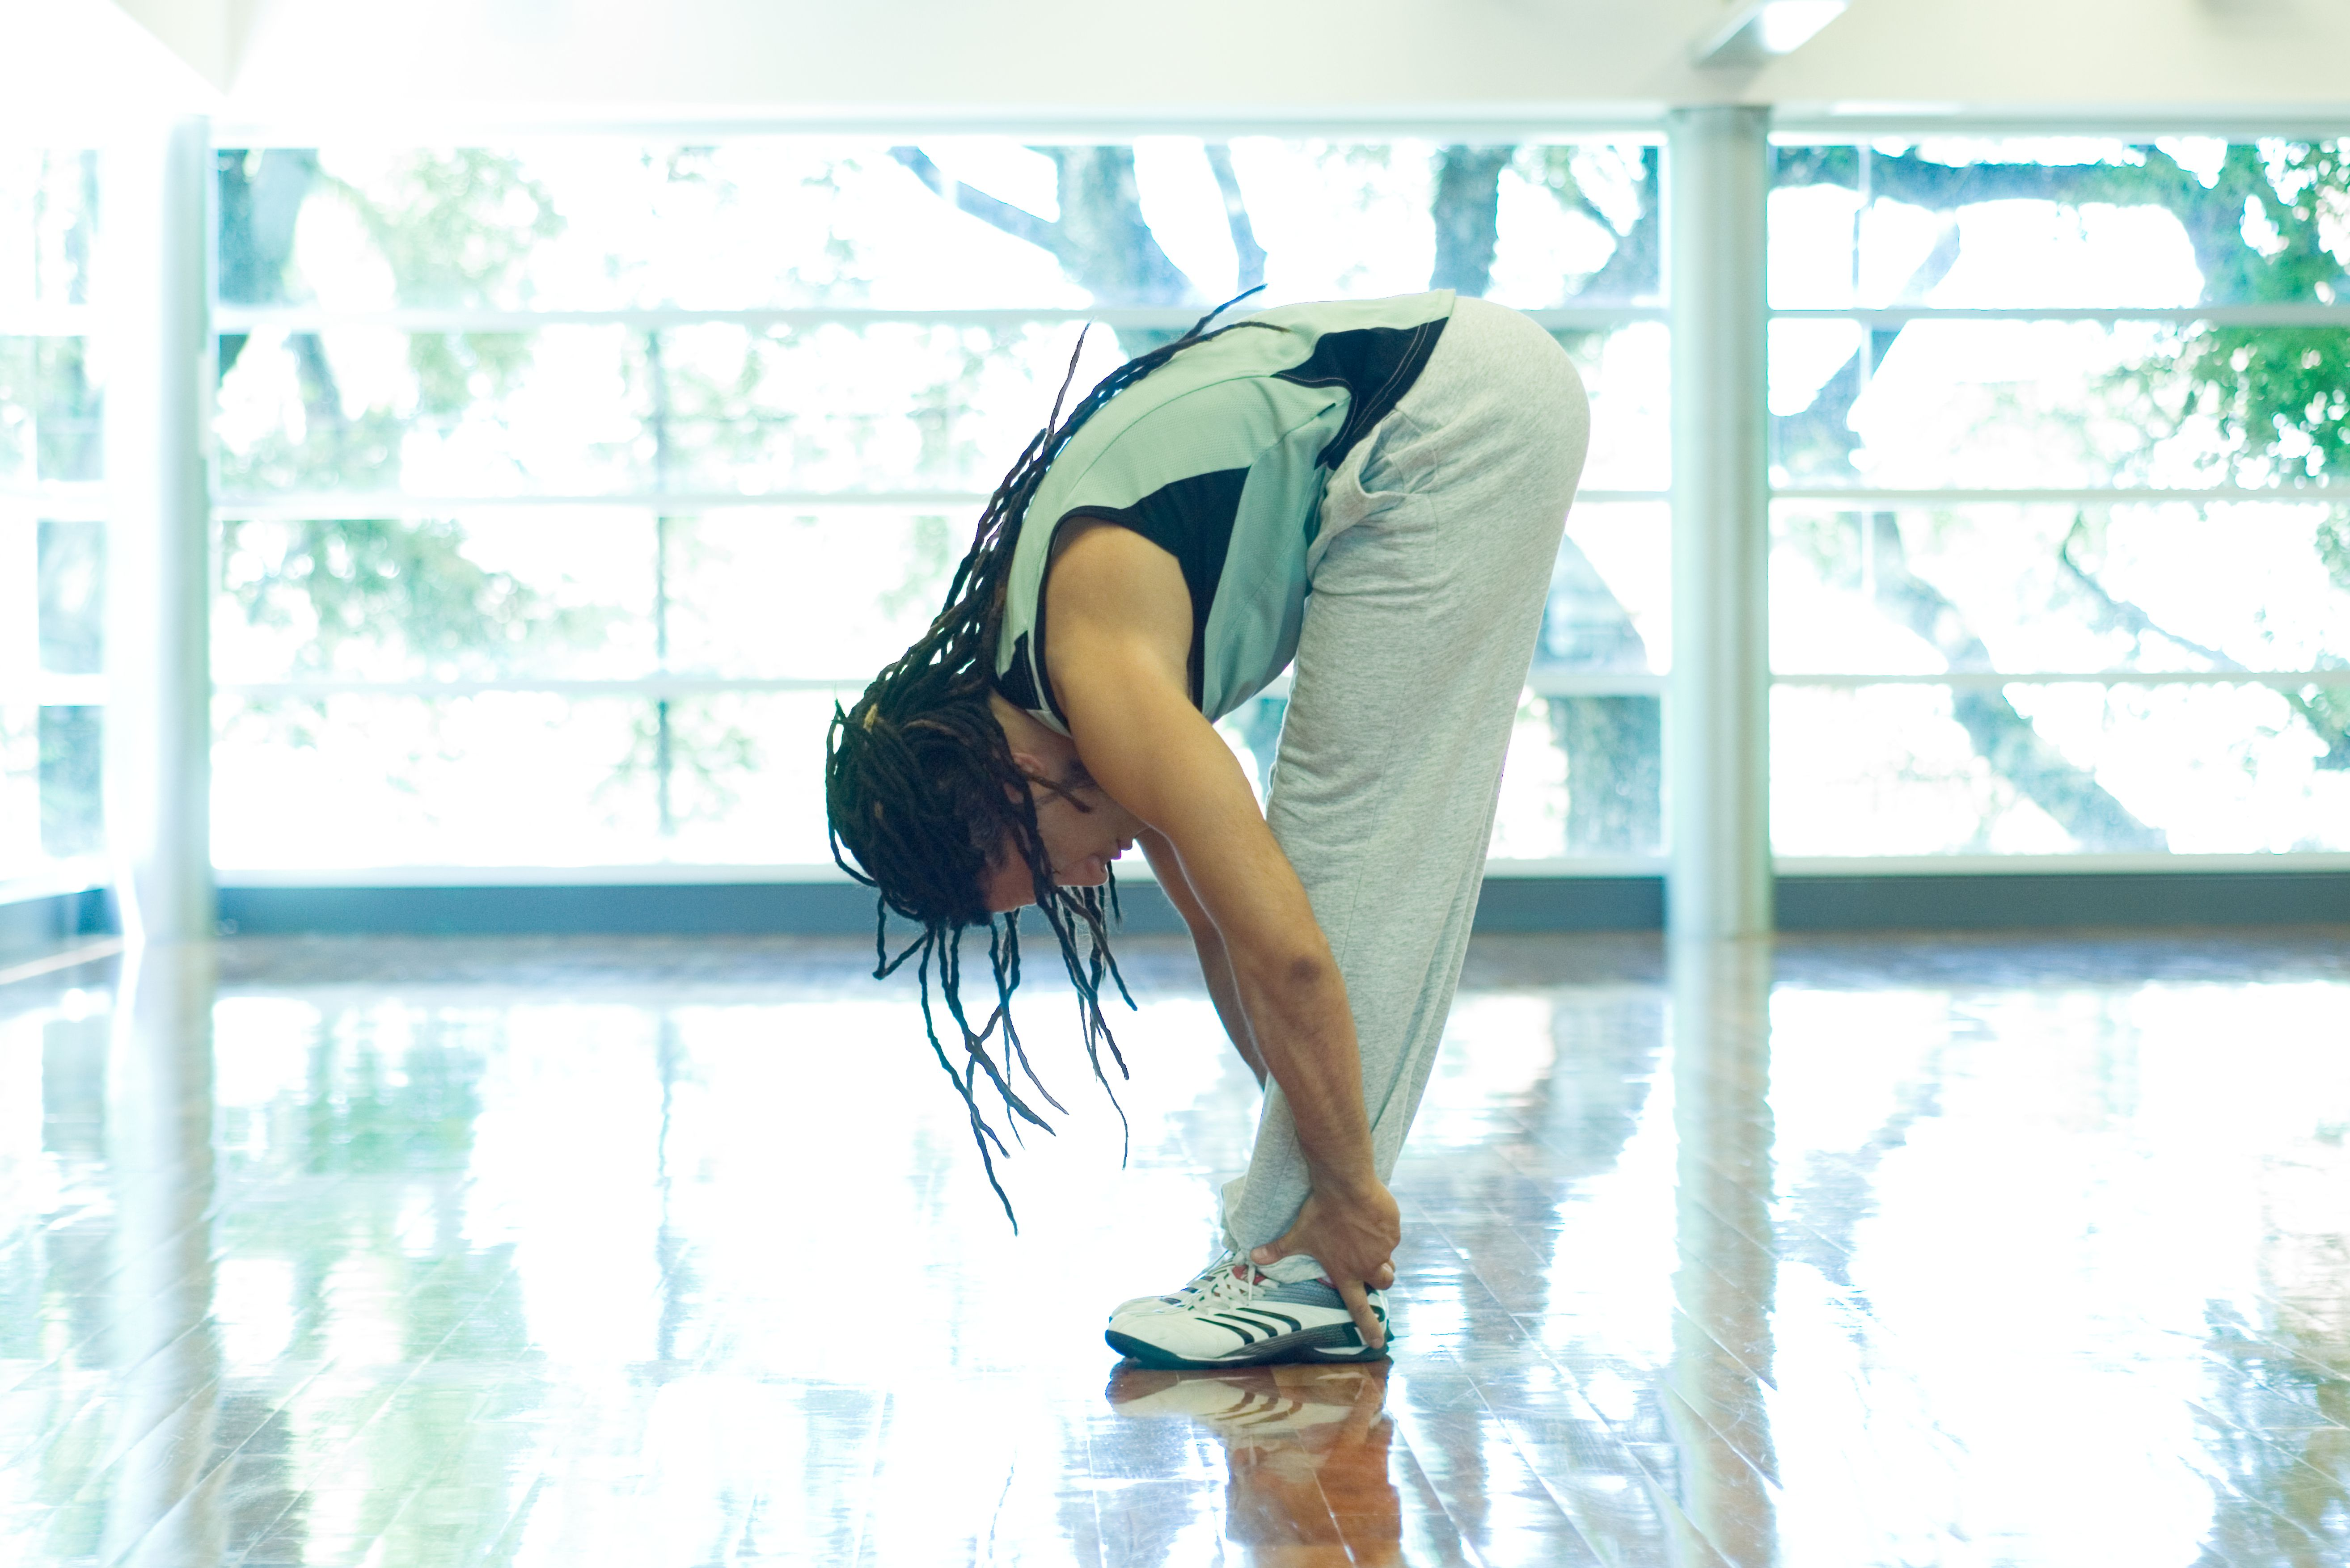 Man doing standing forward bend, full length, side view